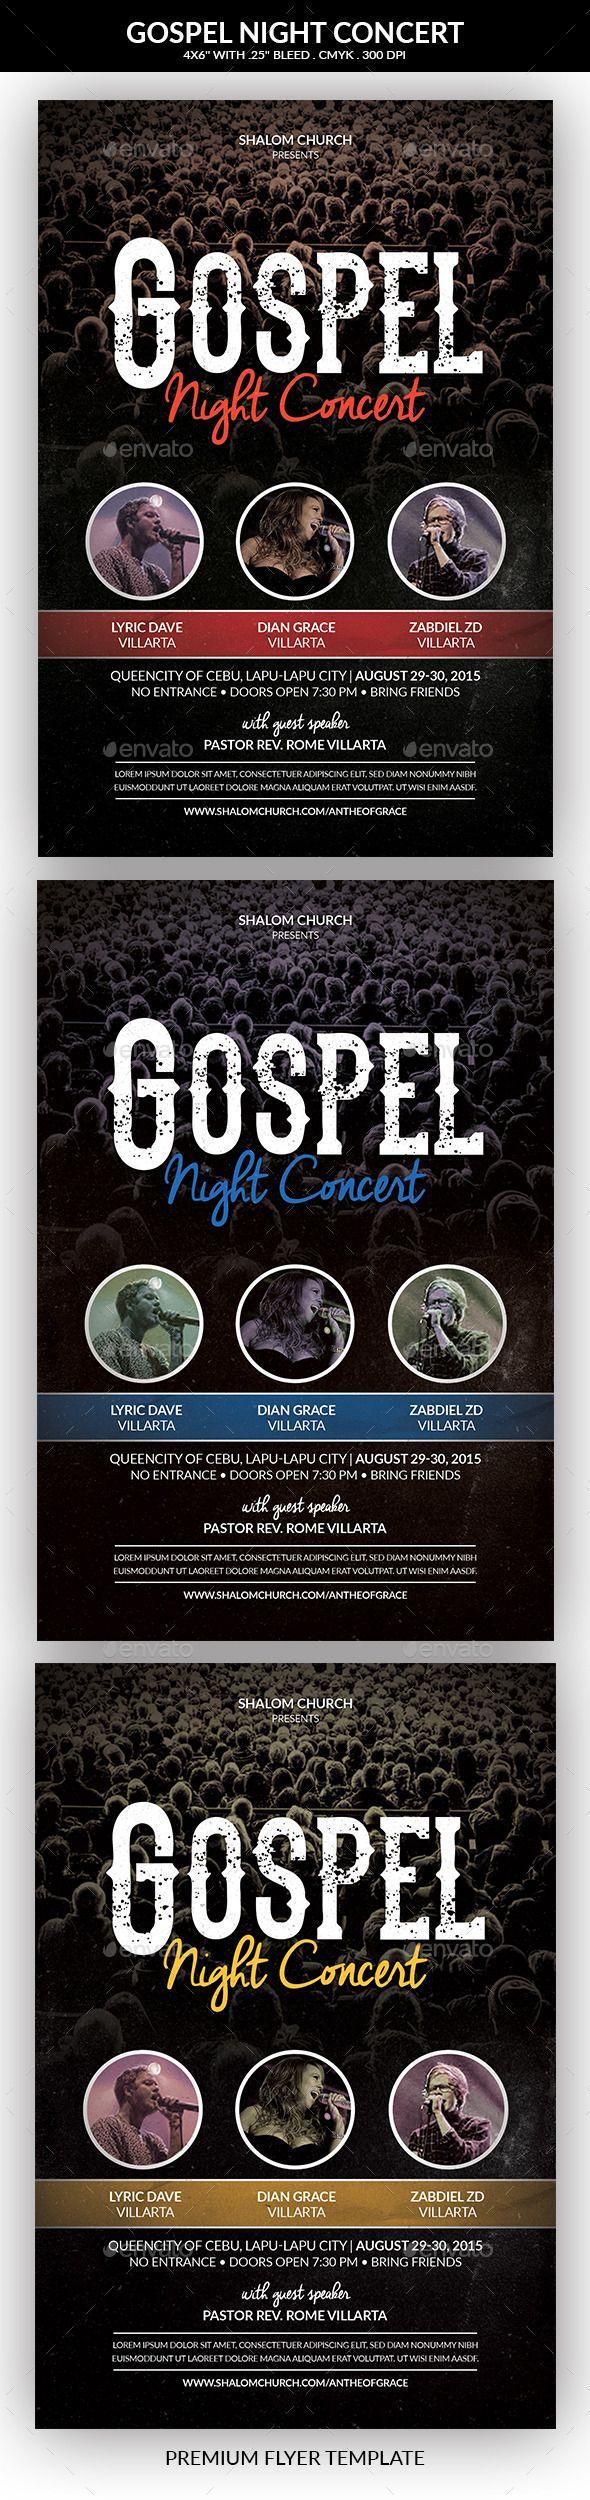 Gospel Night Concert Church Flyer | Churches, Flyer template and ...